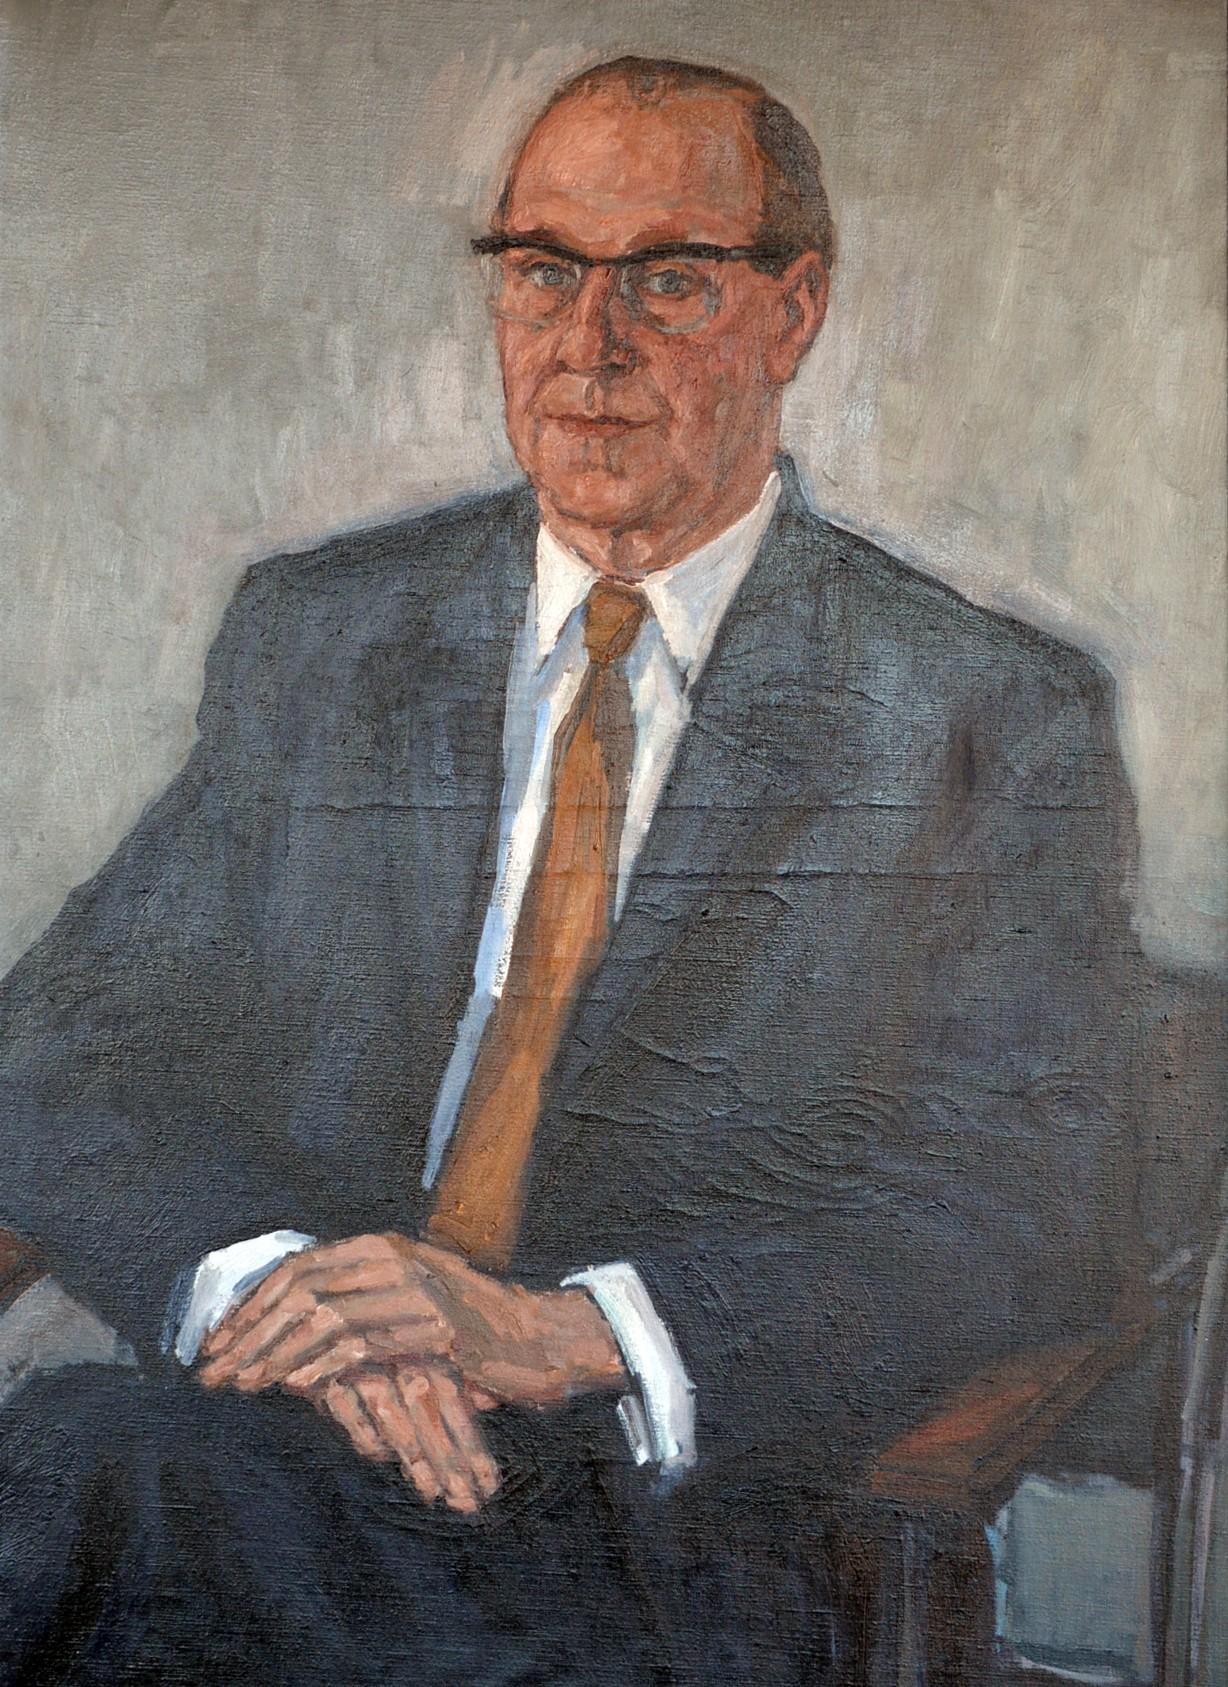 Ministerpräsidenten Nrw Seit 1946